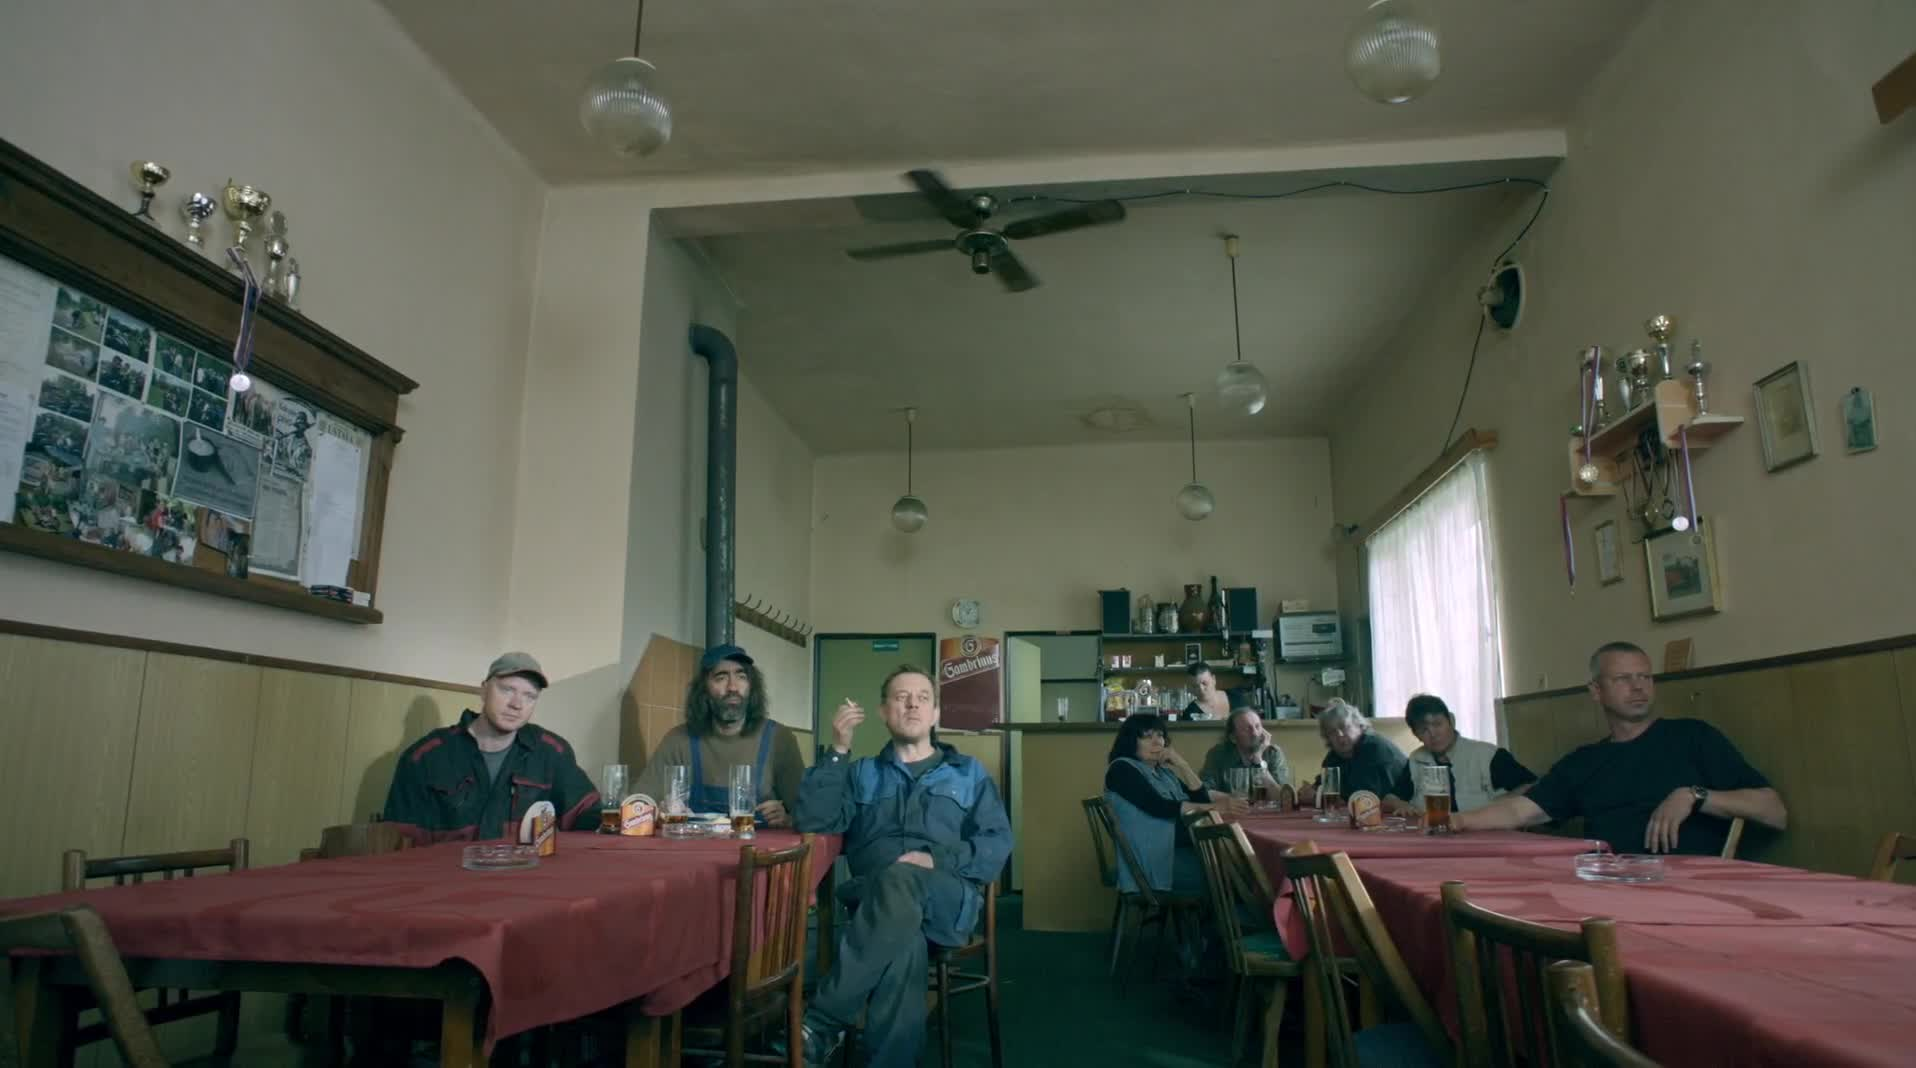 Instalater z Tuchlovic 2016 CZ film